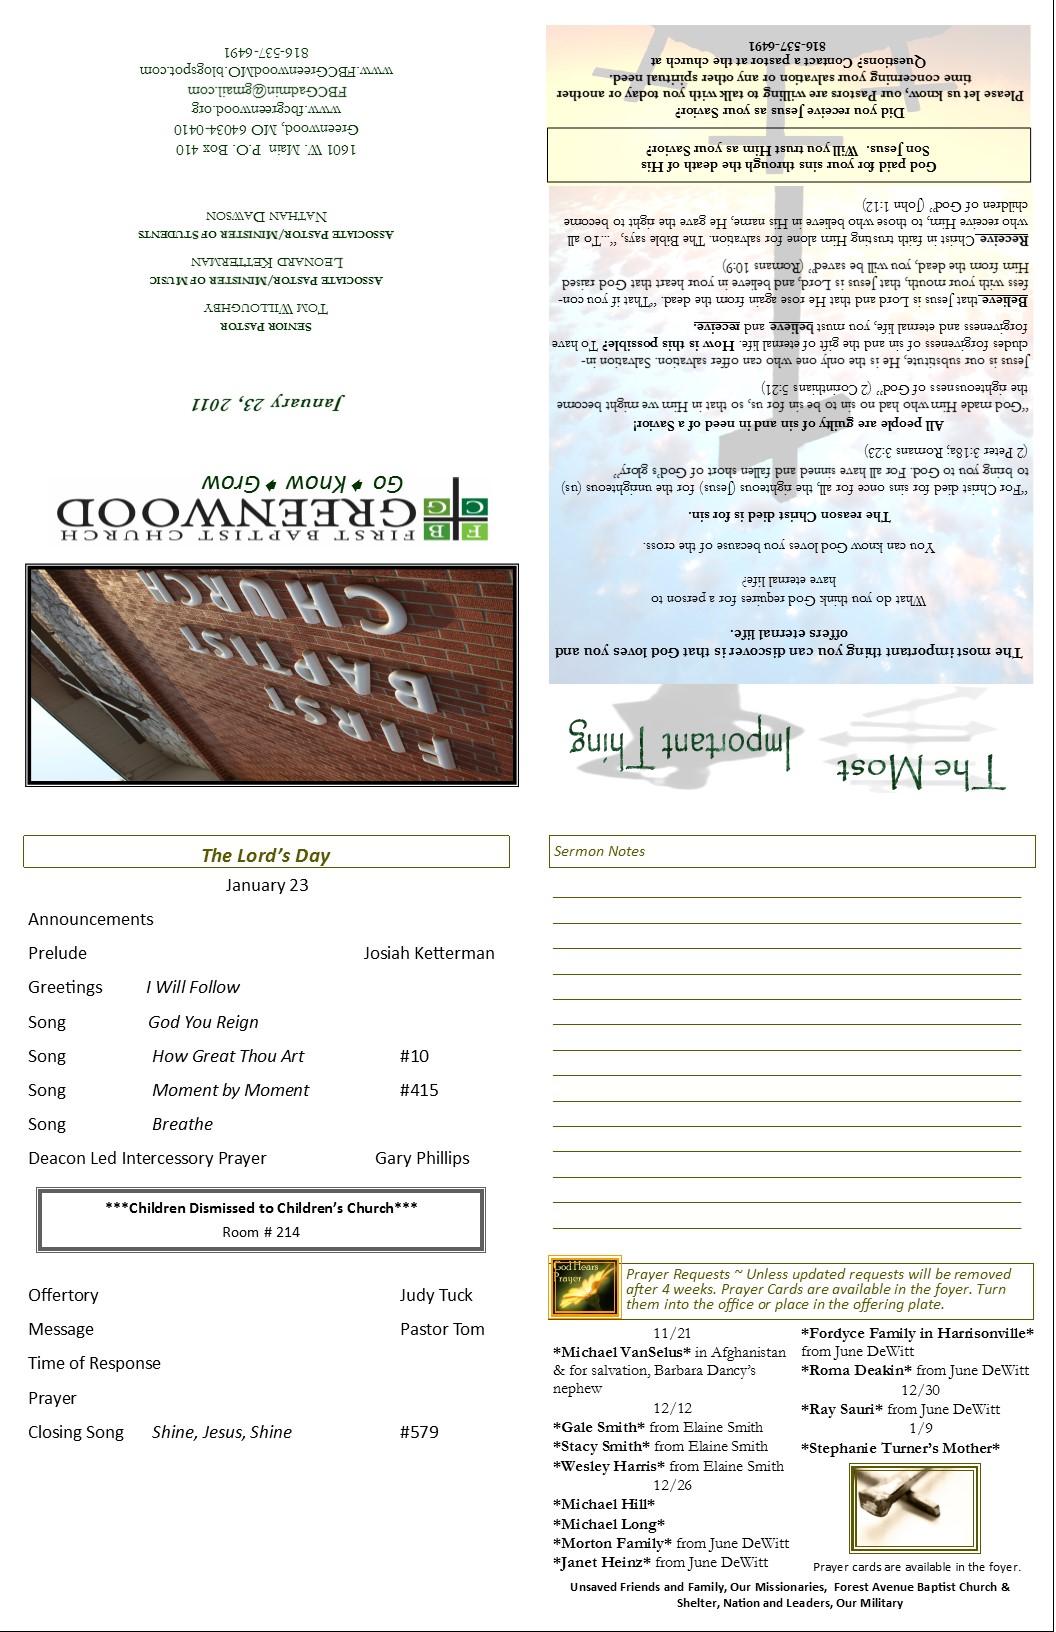 Church Bulletin Samples | Effective Church Communications